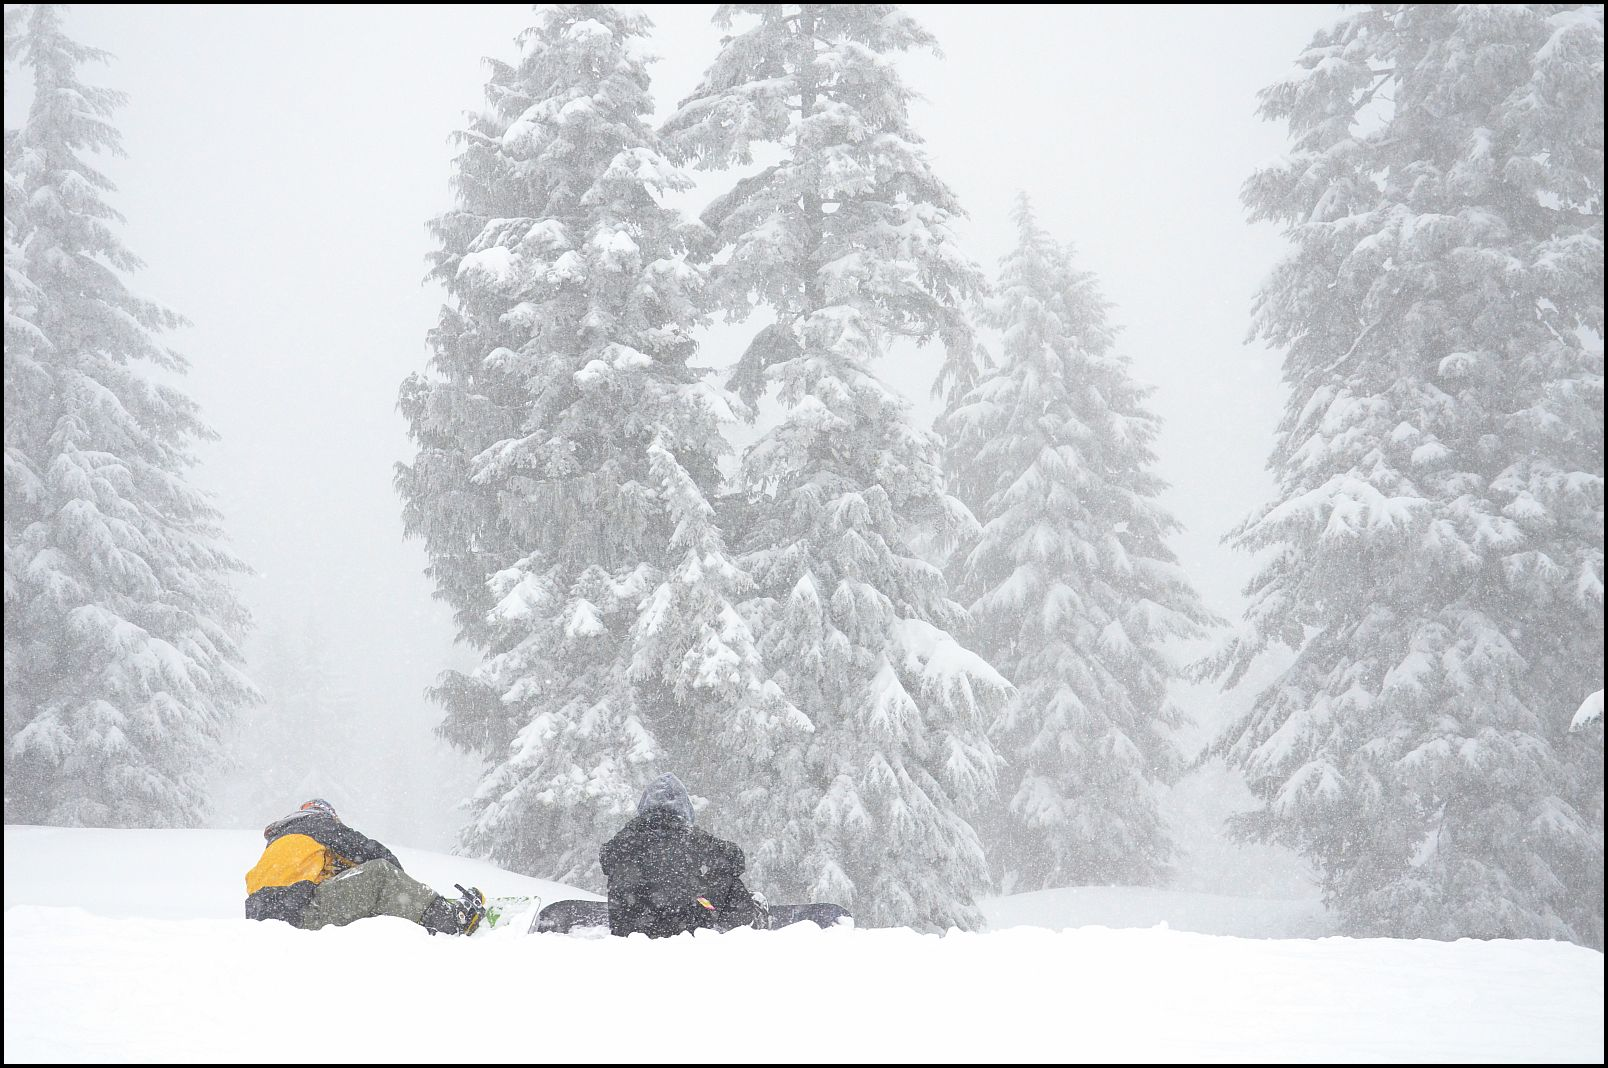 Mount Seymour BC, Snow, Mt Seymour